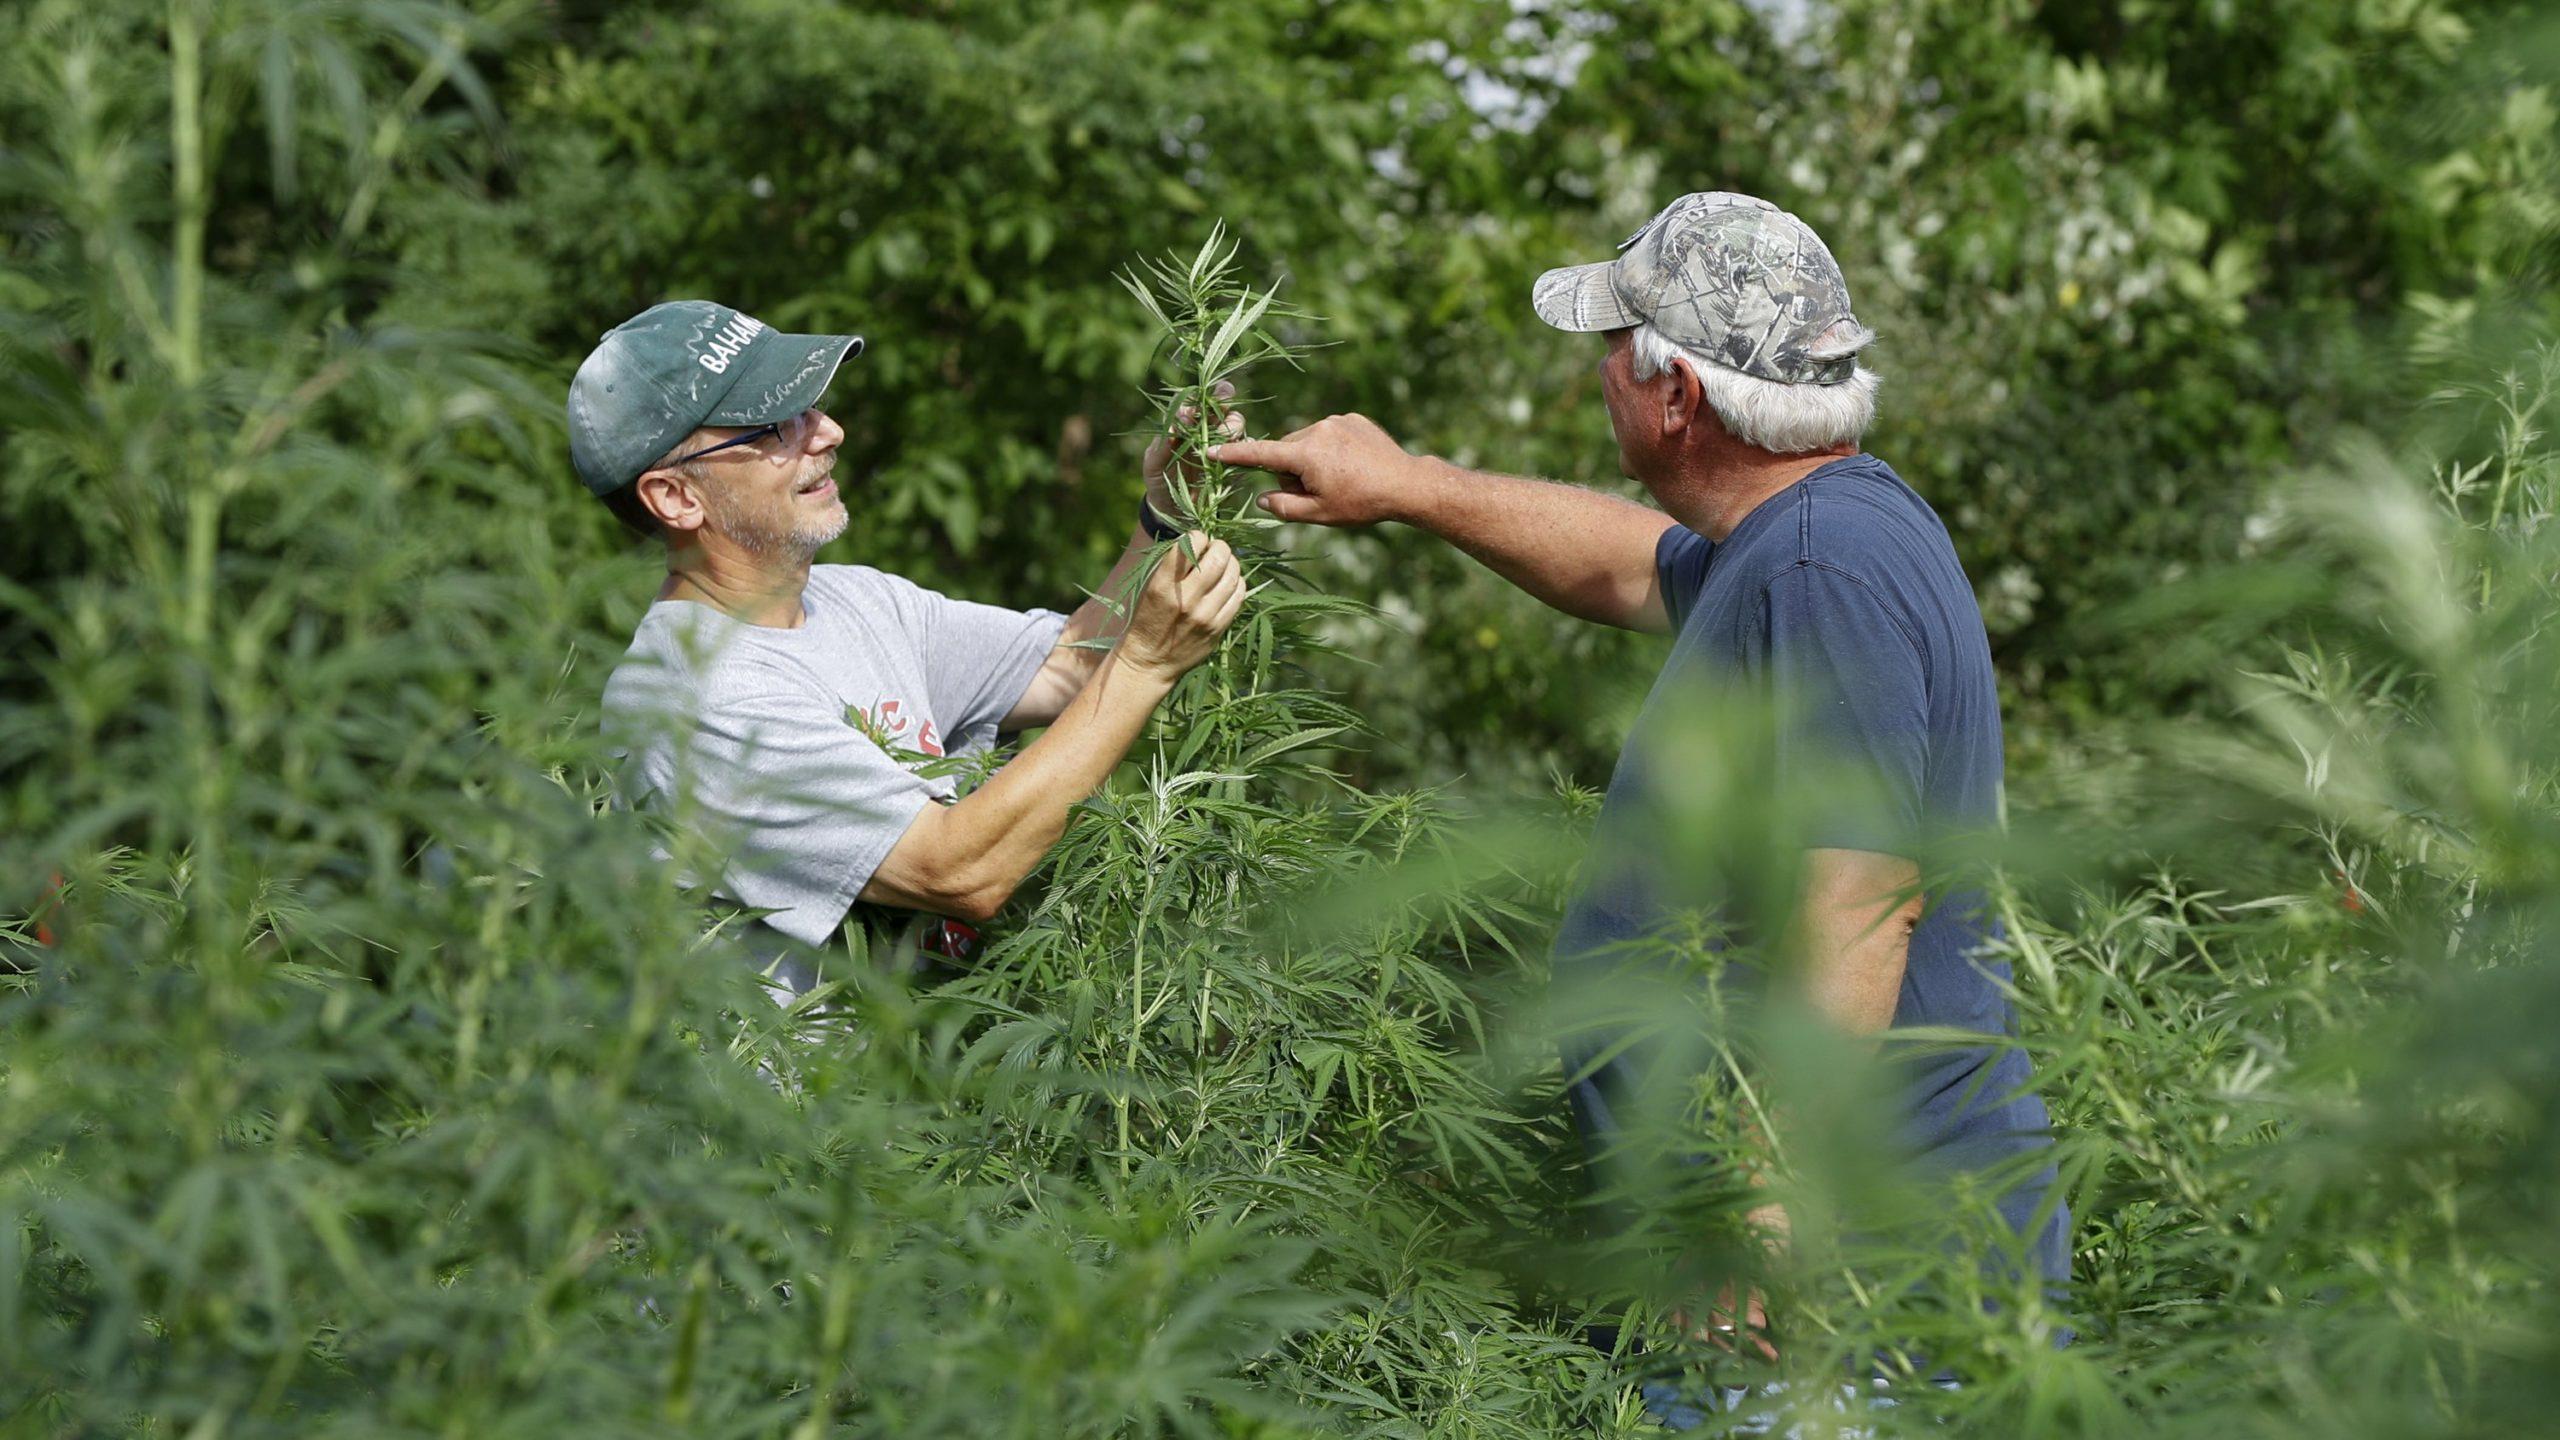 Legal hemp, CBD stir more farmers to grow unfamiliar crop - The Associated Press